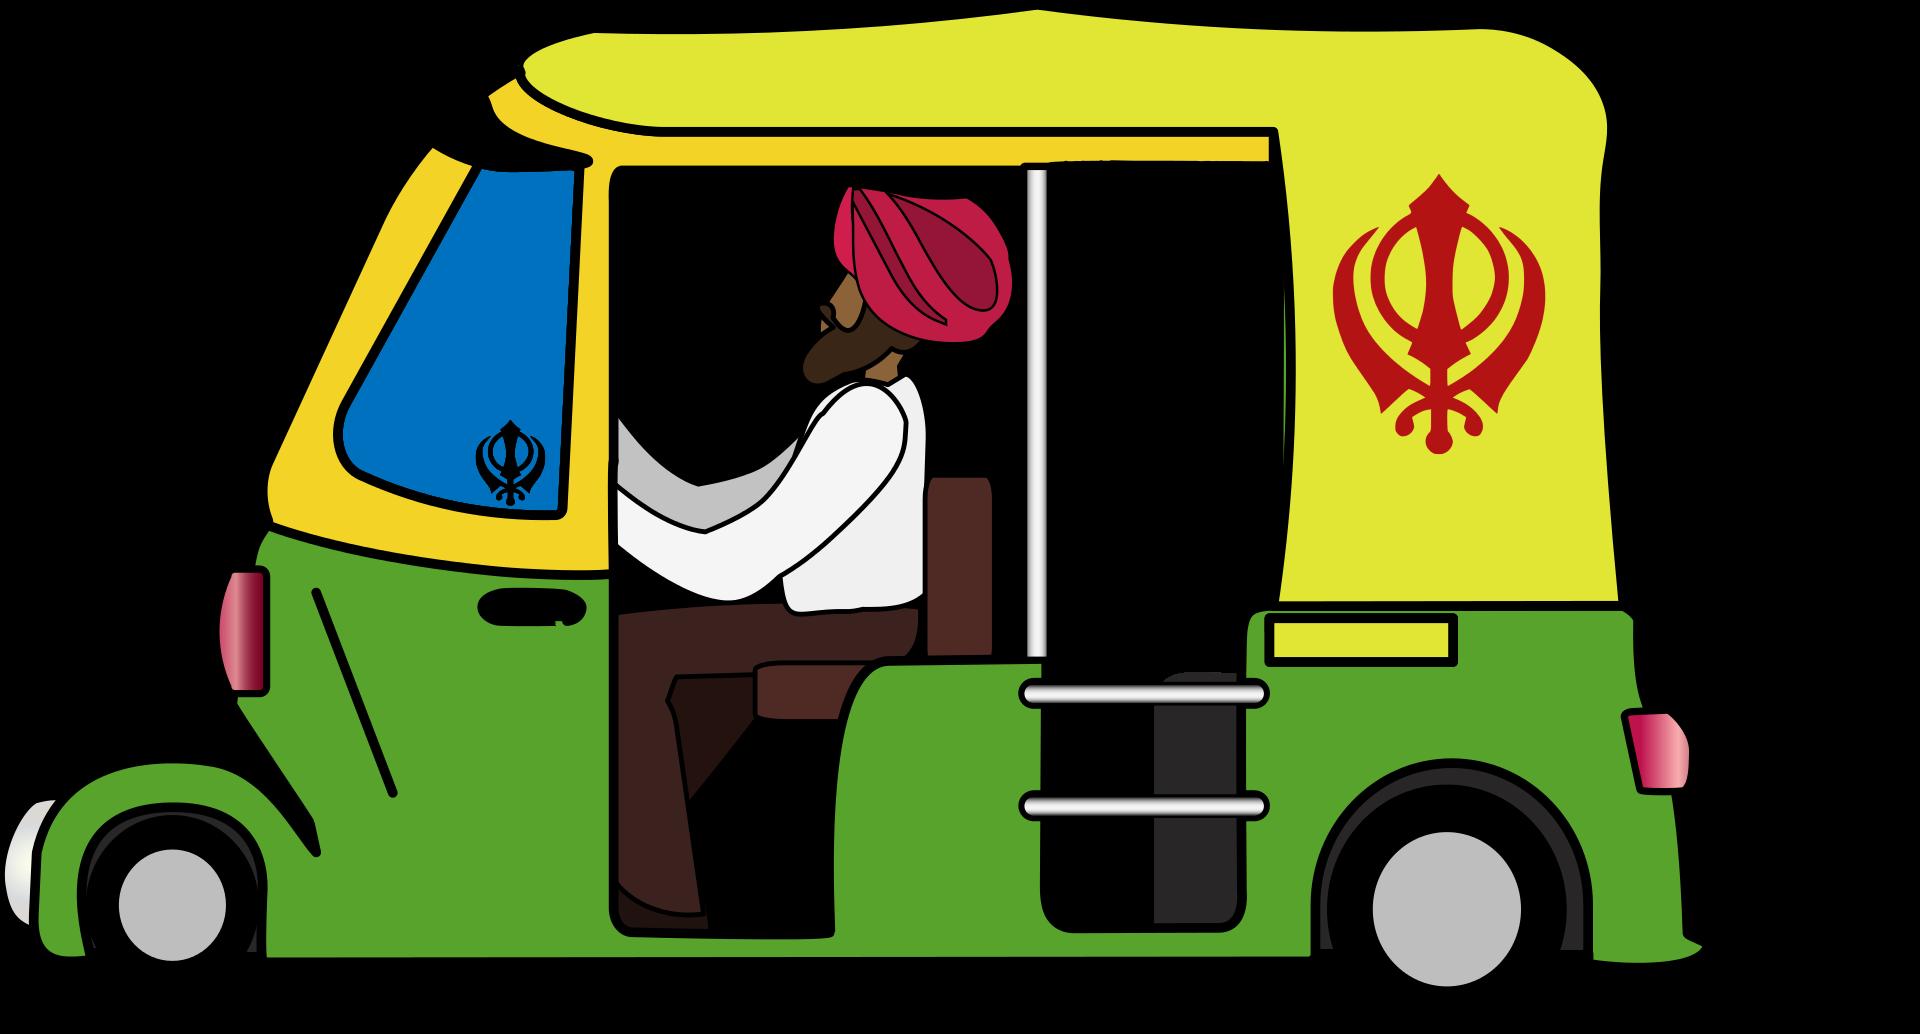 Auto rickshaw cartoon clipart picture freeuse library svg transparent download Nina garman autorickshaw. Back clipart auto ... picture freeuse library